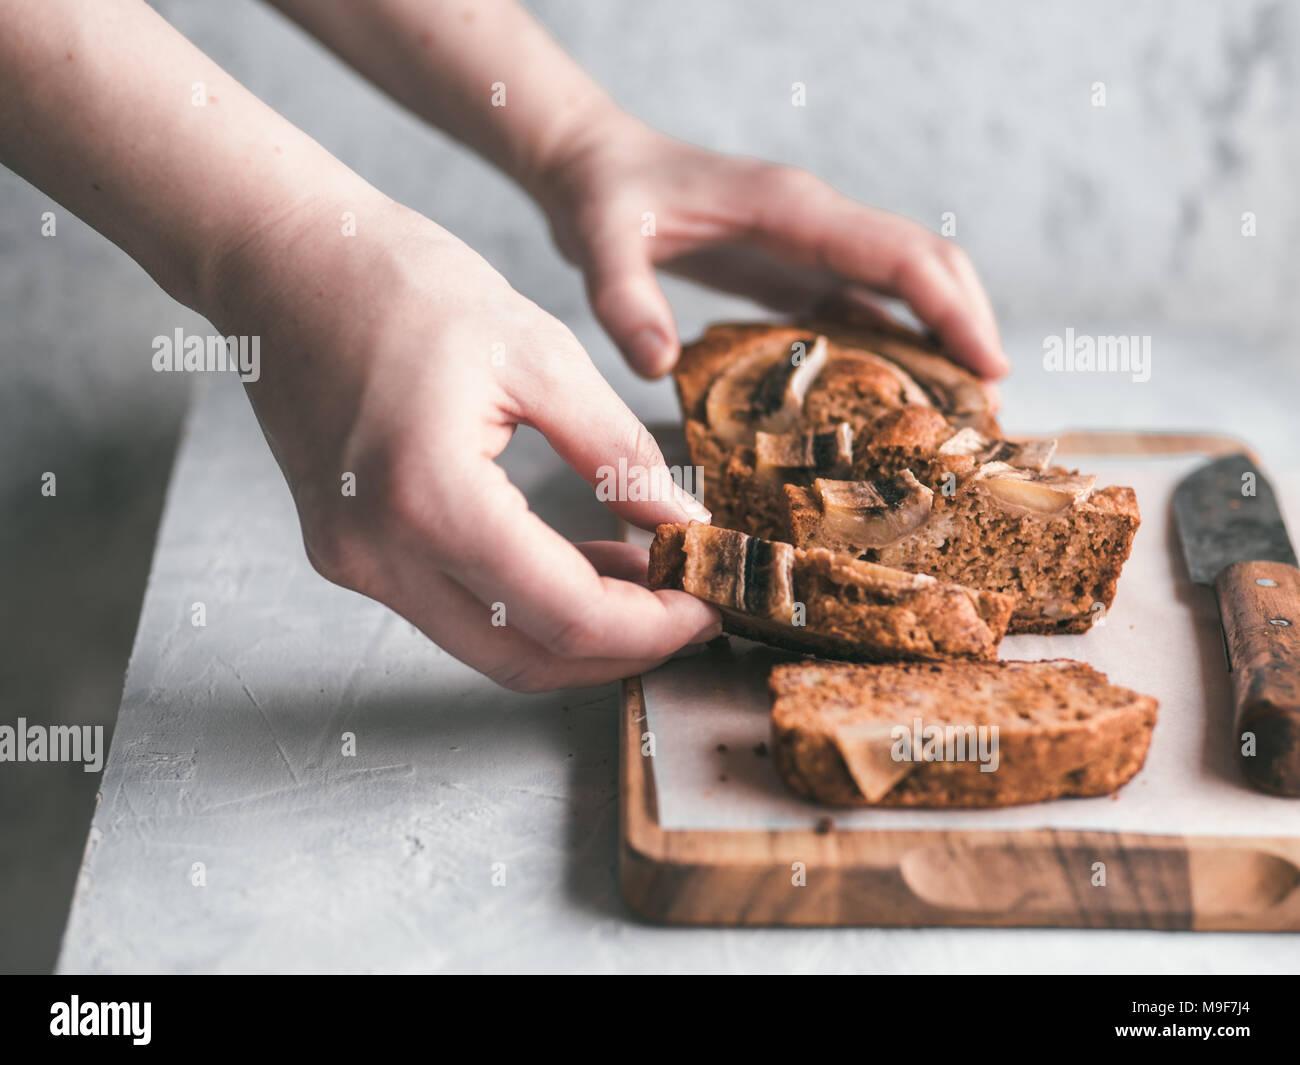 Butter, Zucker-freien Bananenbrot mit Hafermehl, weiche Quark, Honig. Frau hand mit Scheibe Bananenbrot auf grau Tabelle. Ideen Rezept gesunde Ernährung Frühstück. Selektiver Fokus Stockbild